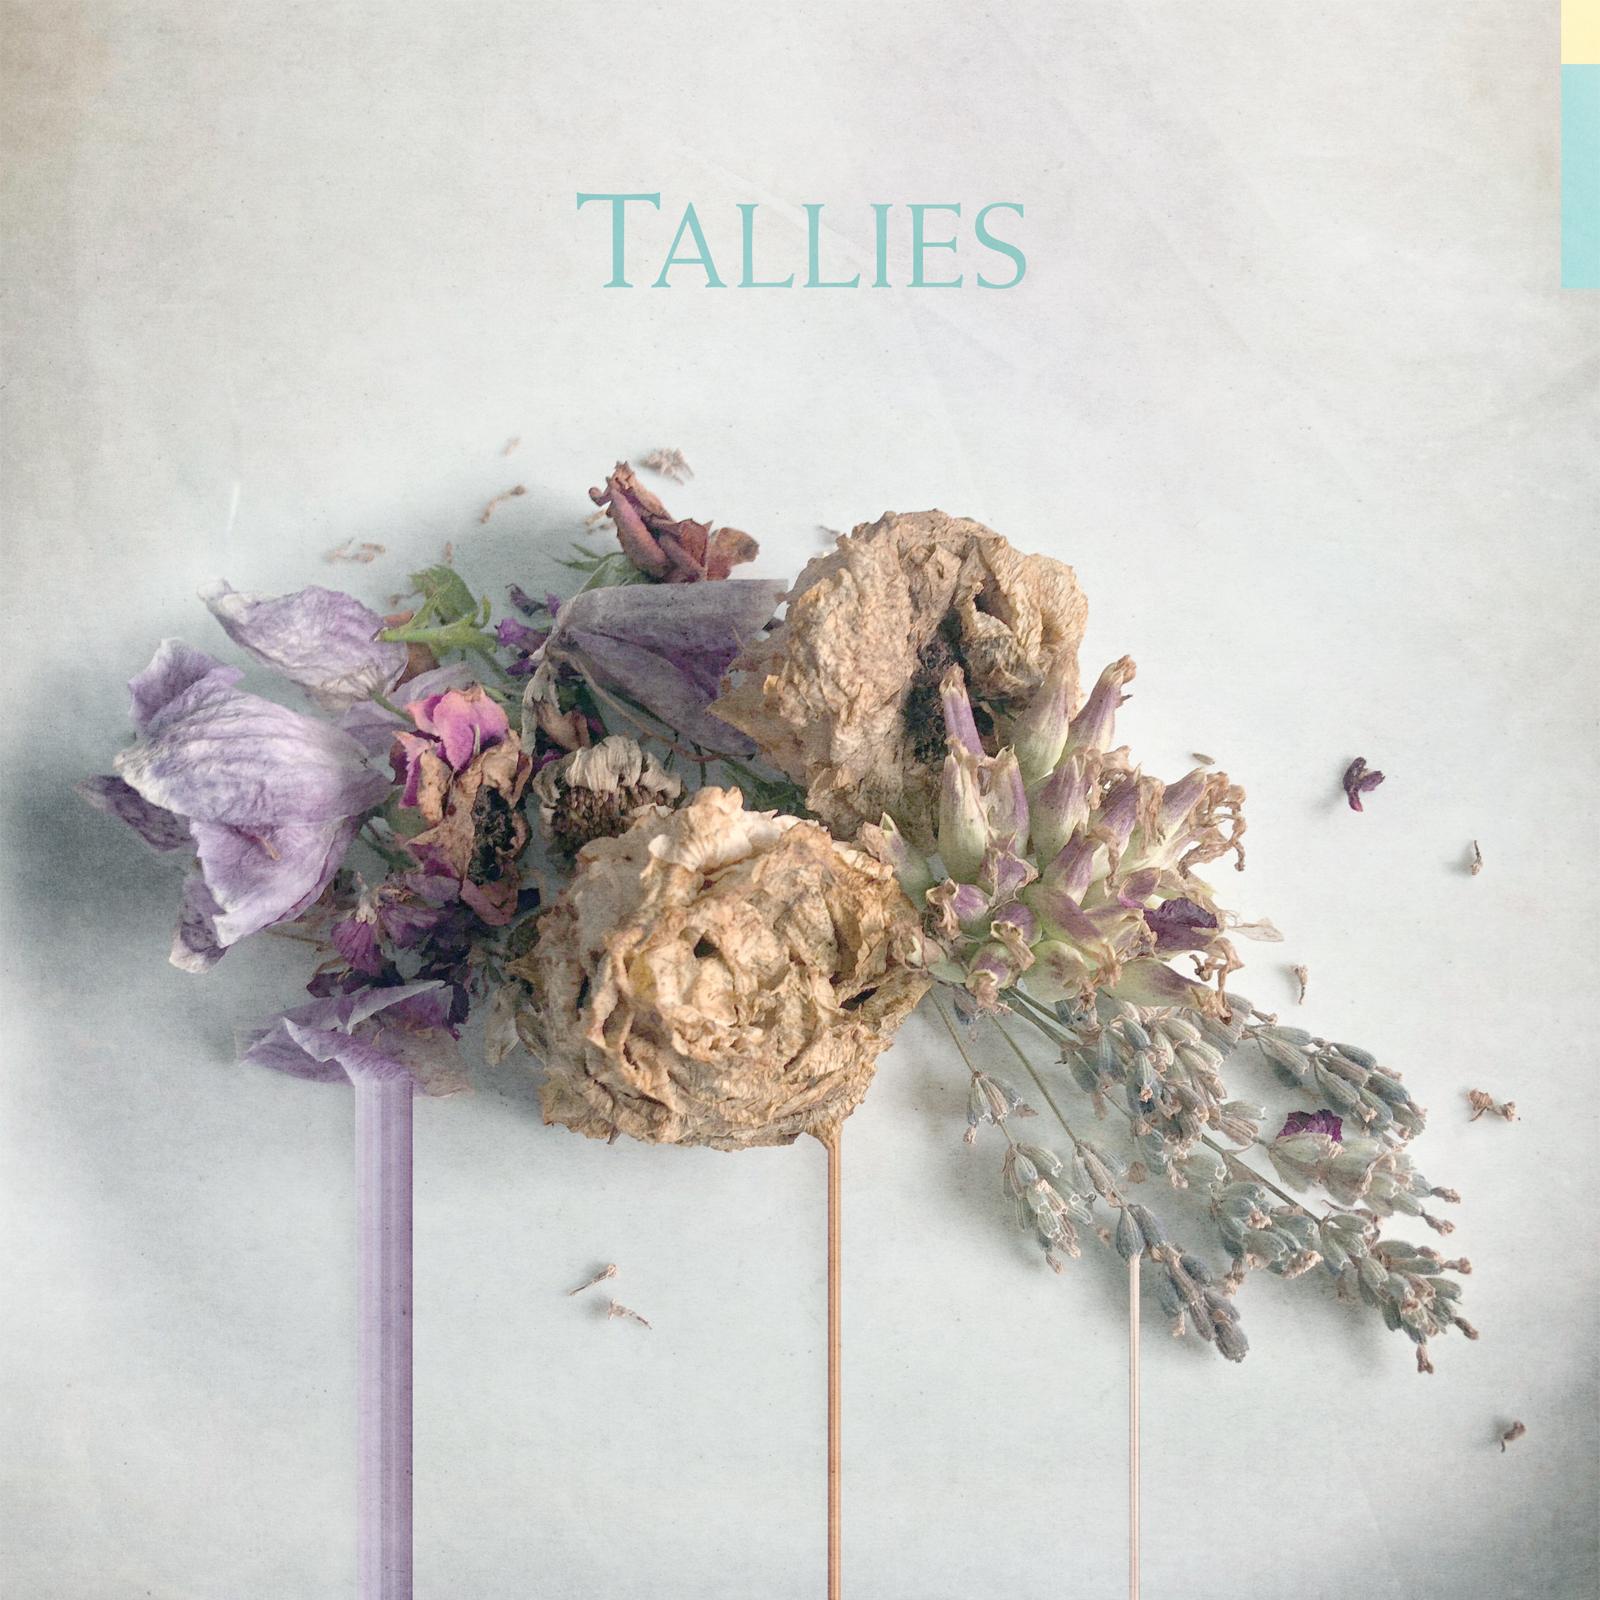 Tallies - Tallies